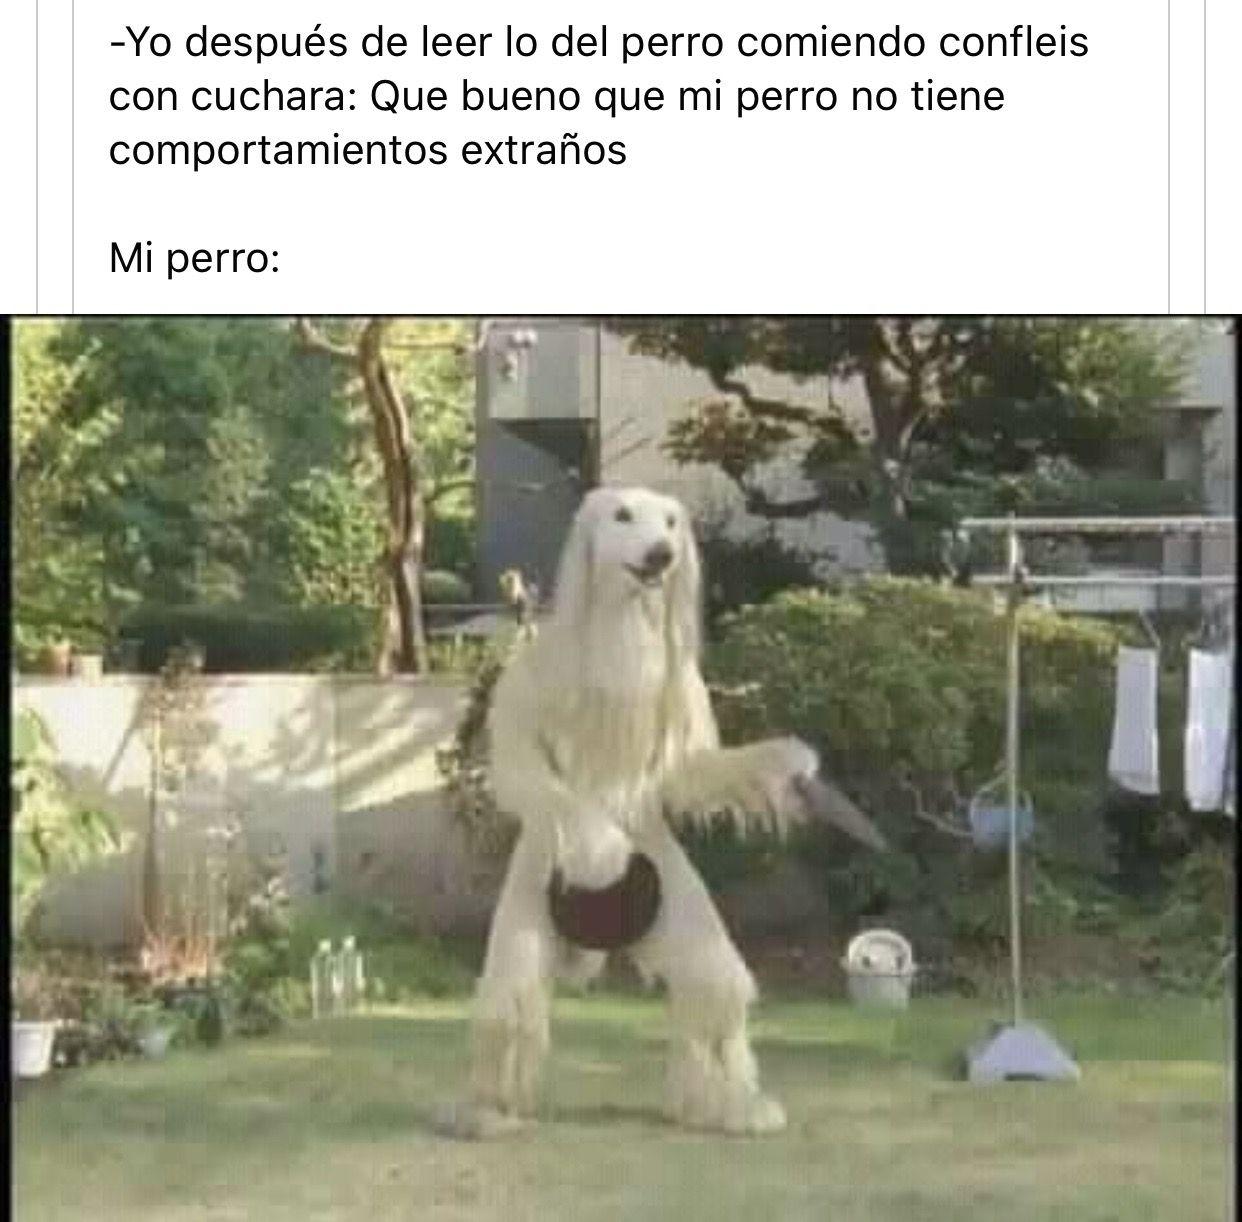 Siempre Expertoanimal Mundoanimal Reinoanimal Animales Naturaleza Mas Memes Divertidos Sobre Perros Imagenes Divertidas De Animales Mascotas Memes